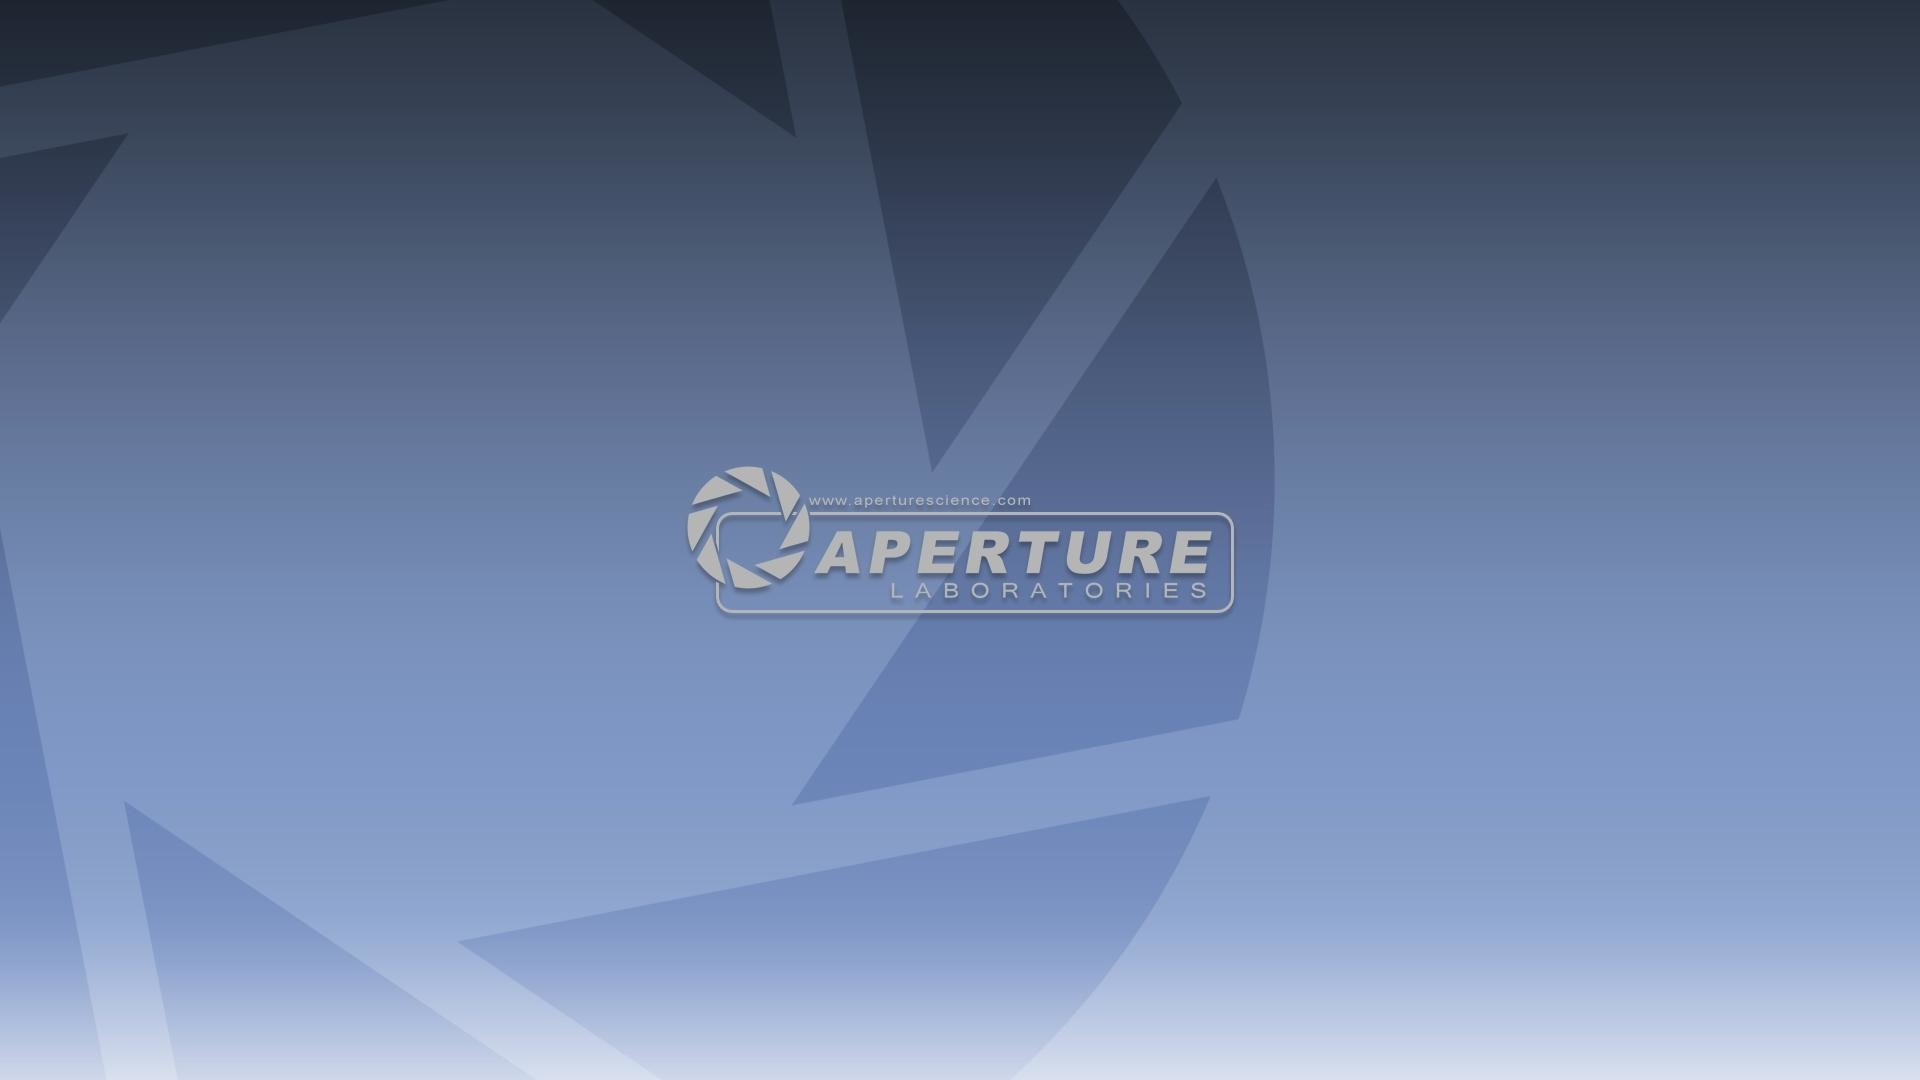 wallpaper.wiki-Aperture-Laboratories-Background-Full-HD-PIC-